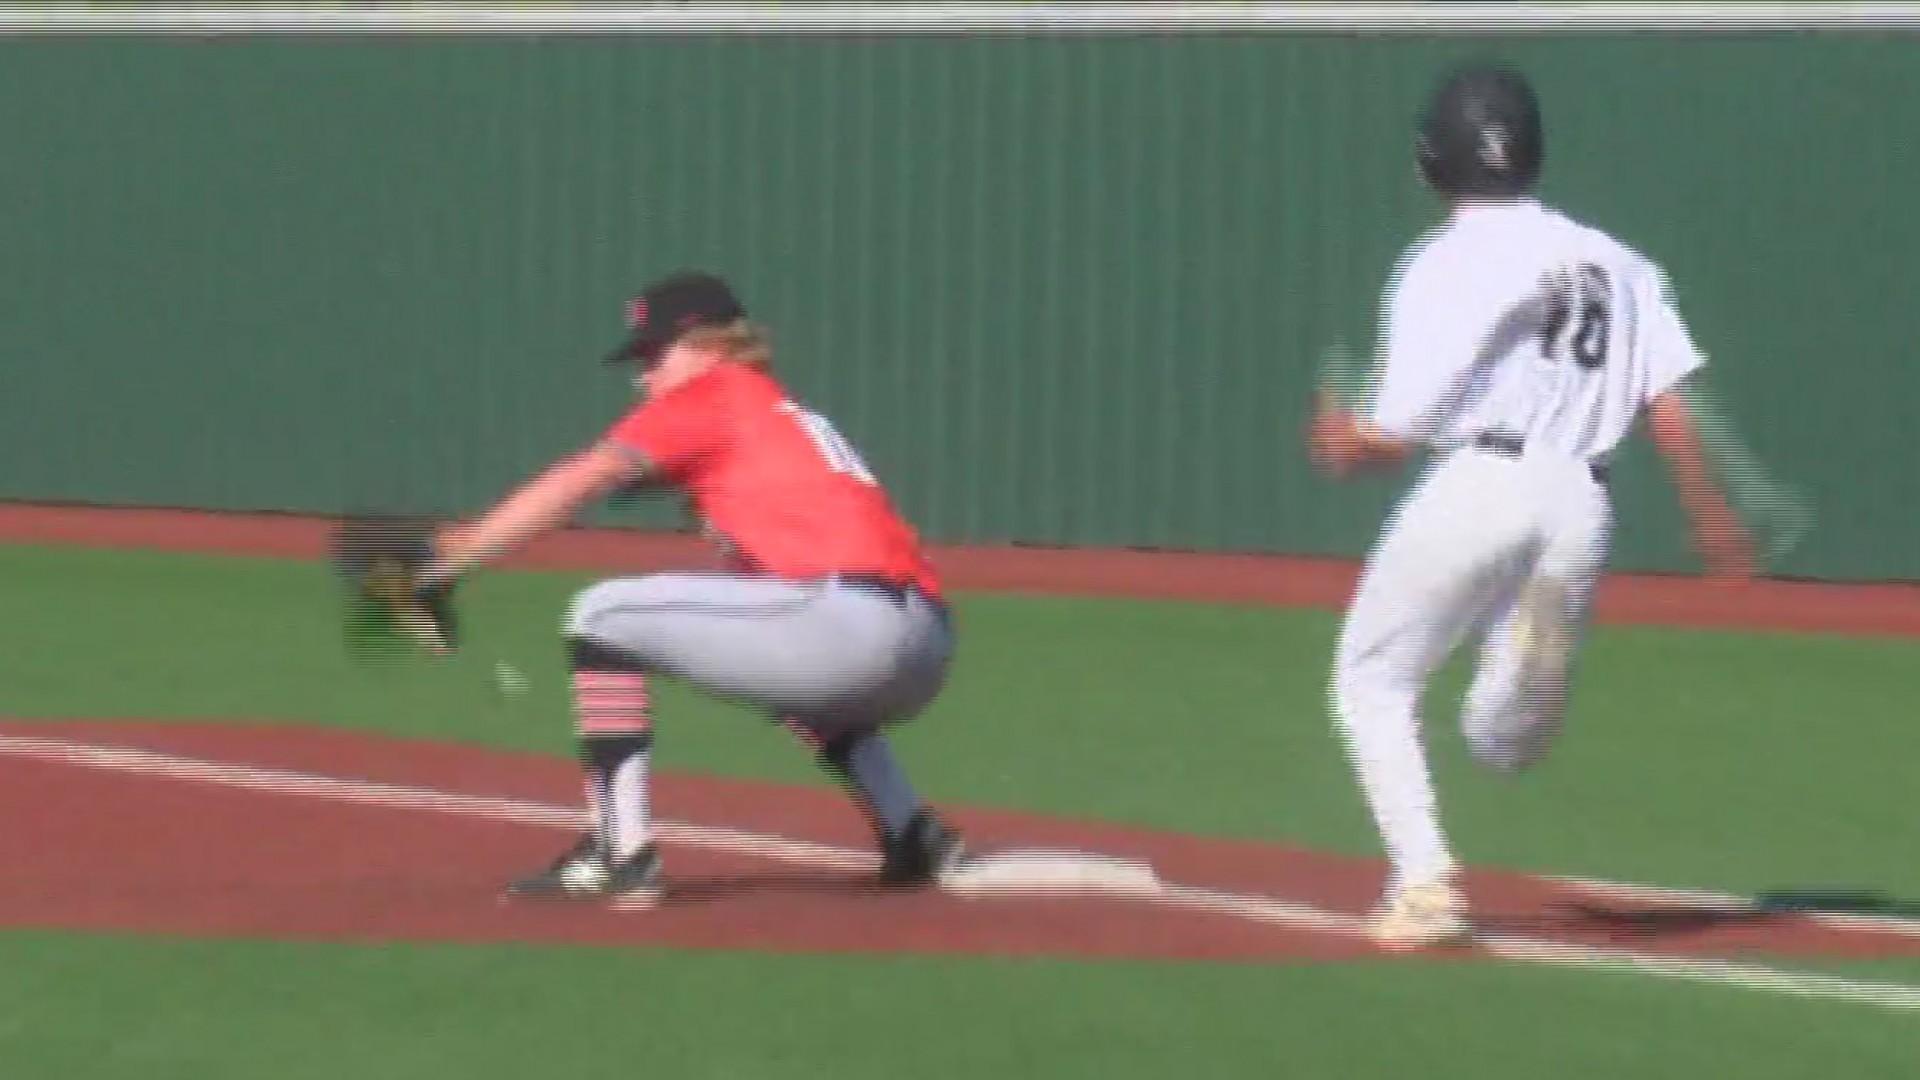 High School Baseball: Aledo at Rider- April 25, 2019